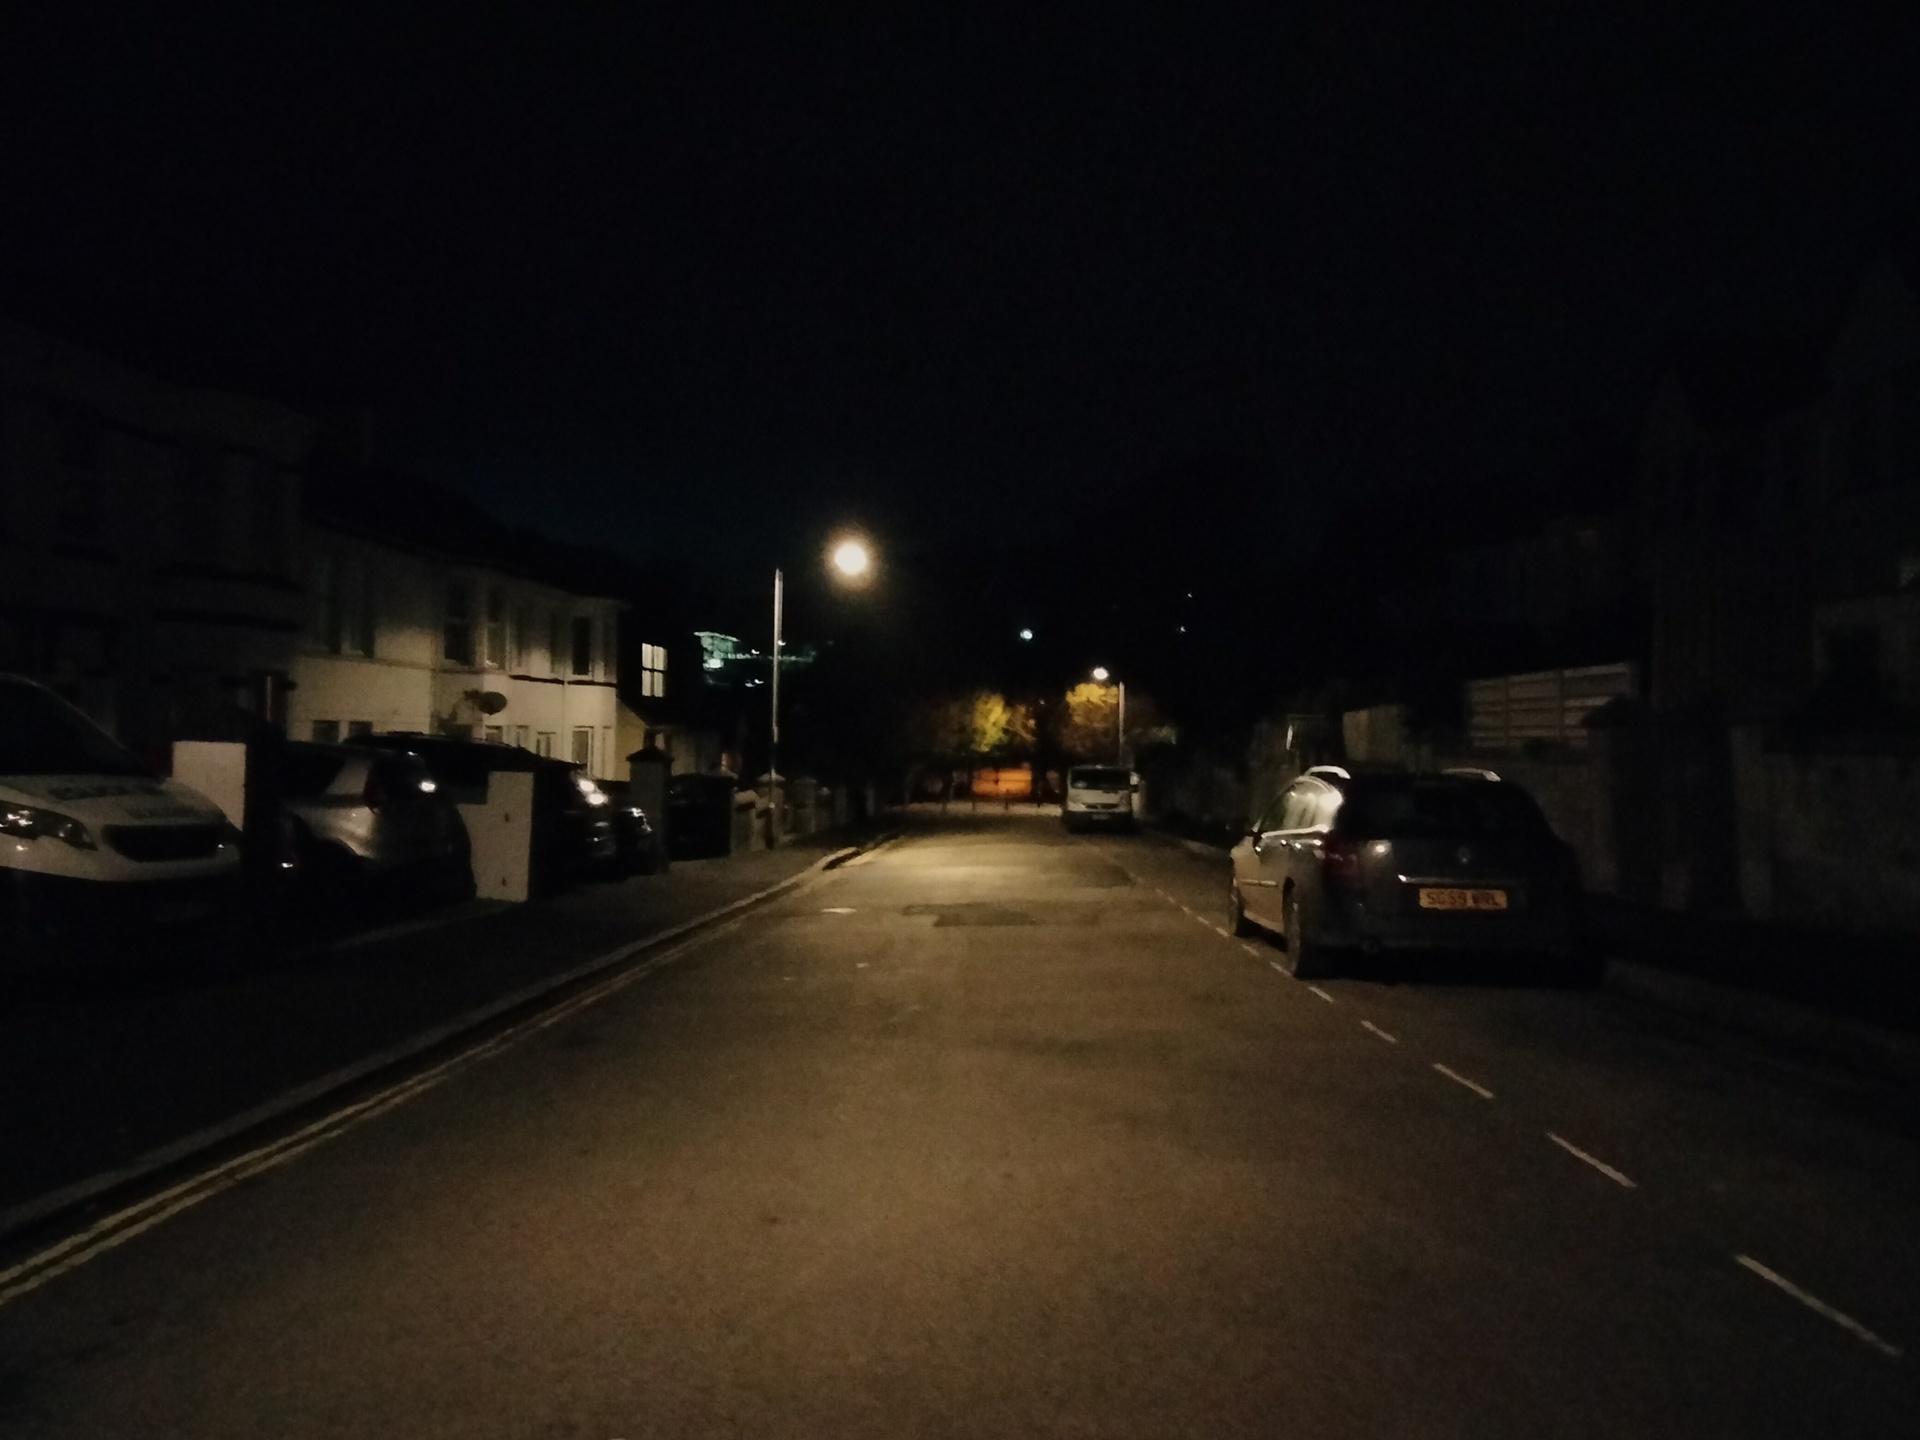 OnePlus Nord N100 photo sample of a dark street